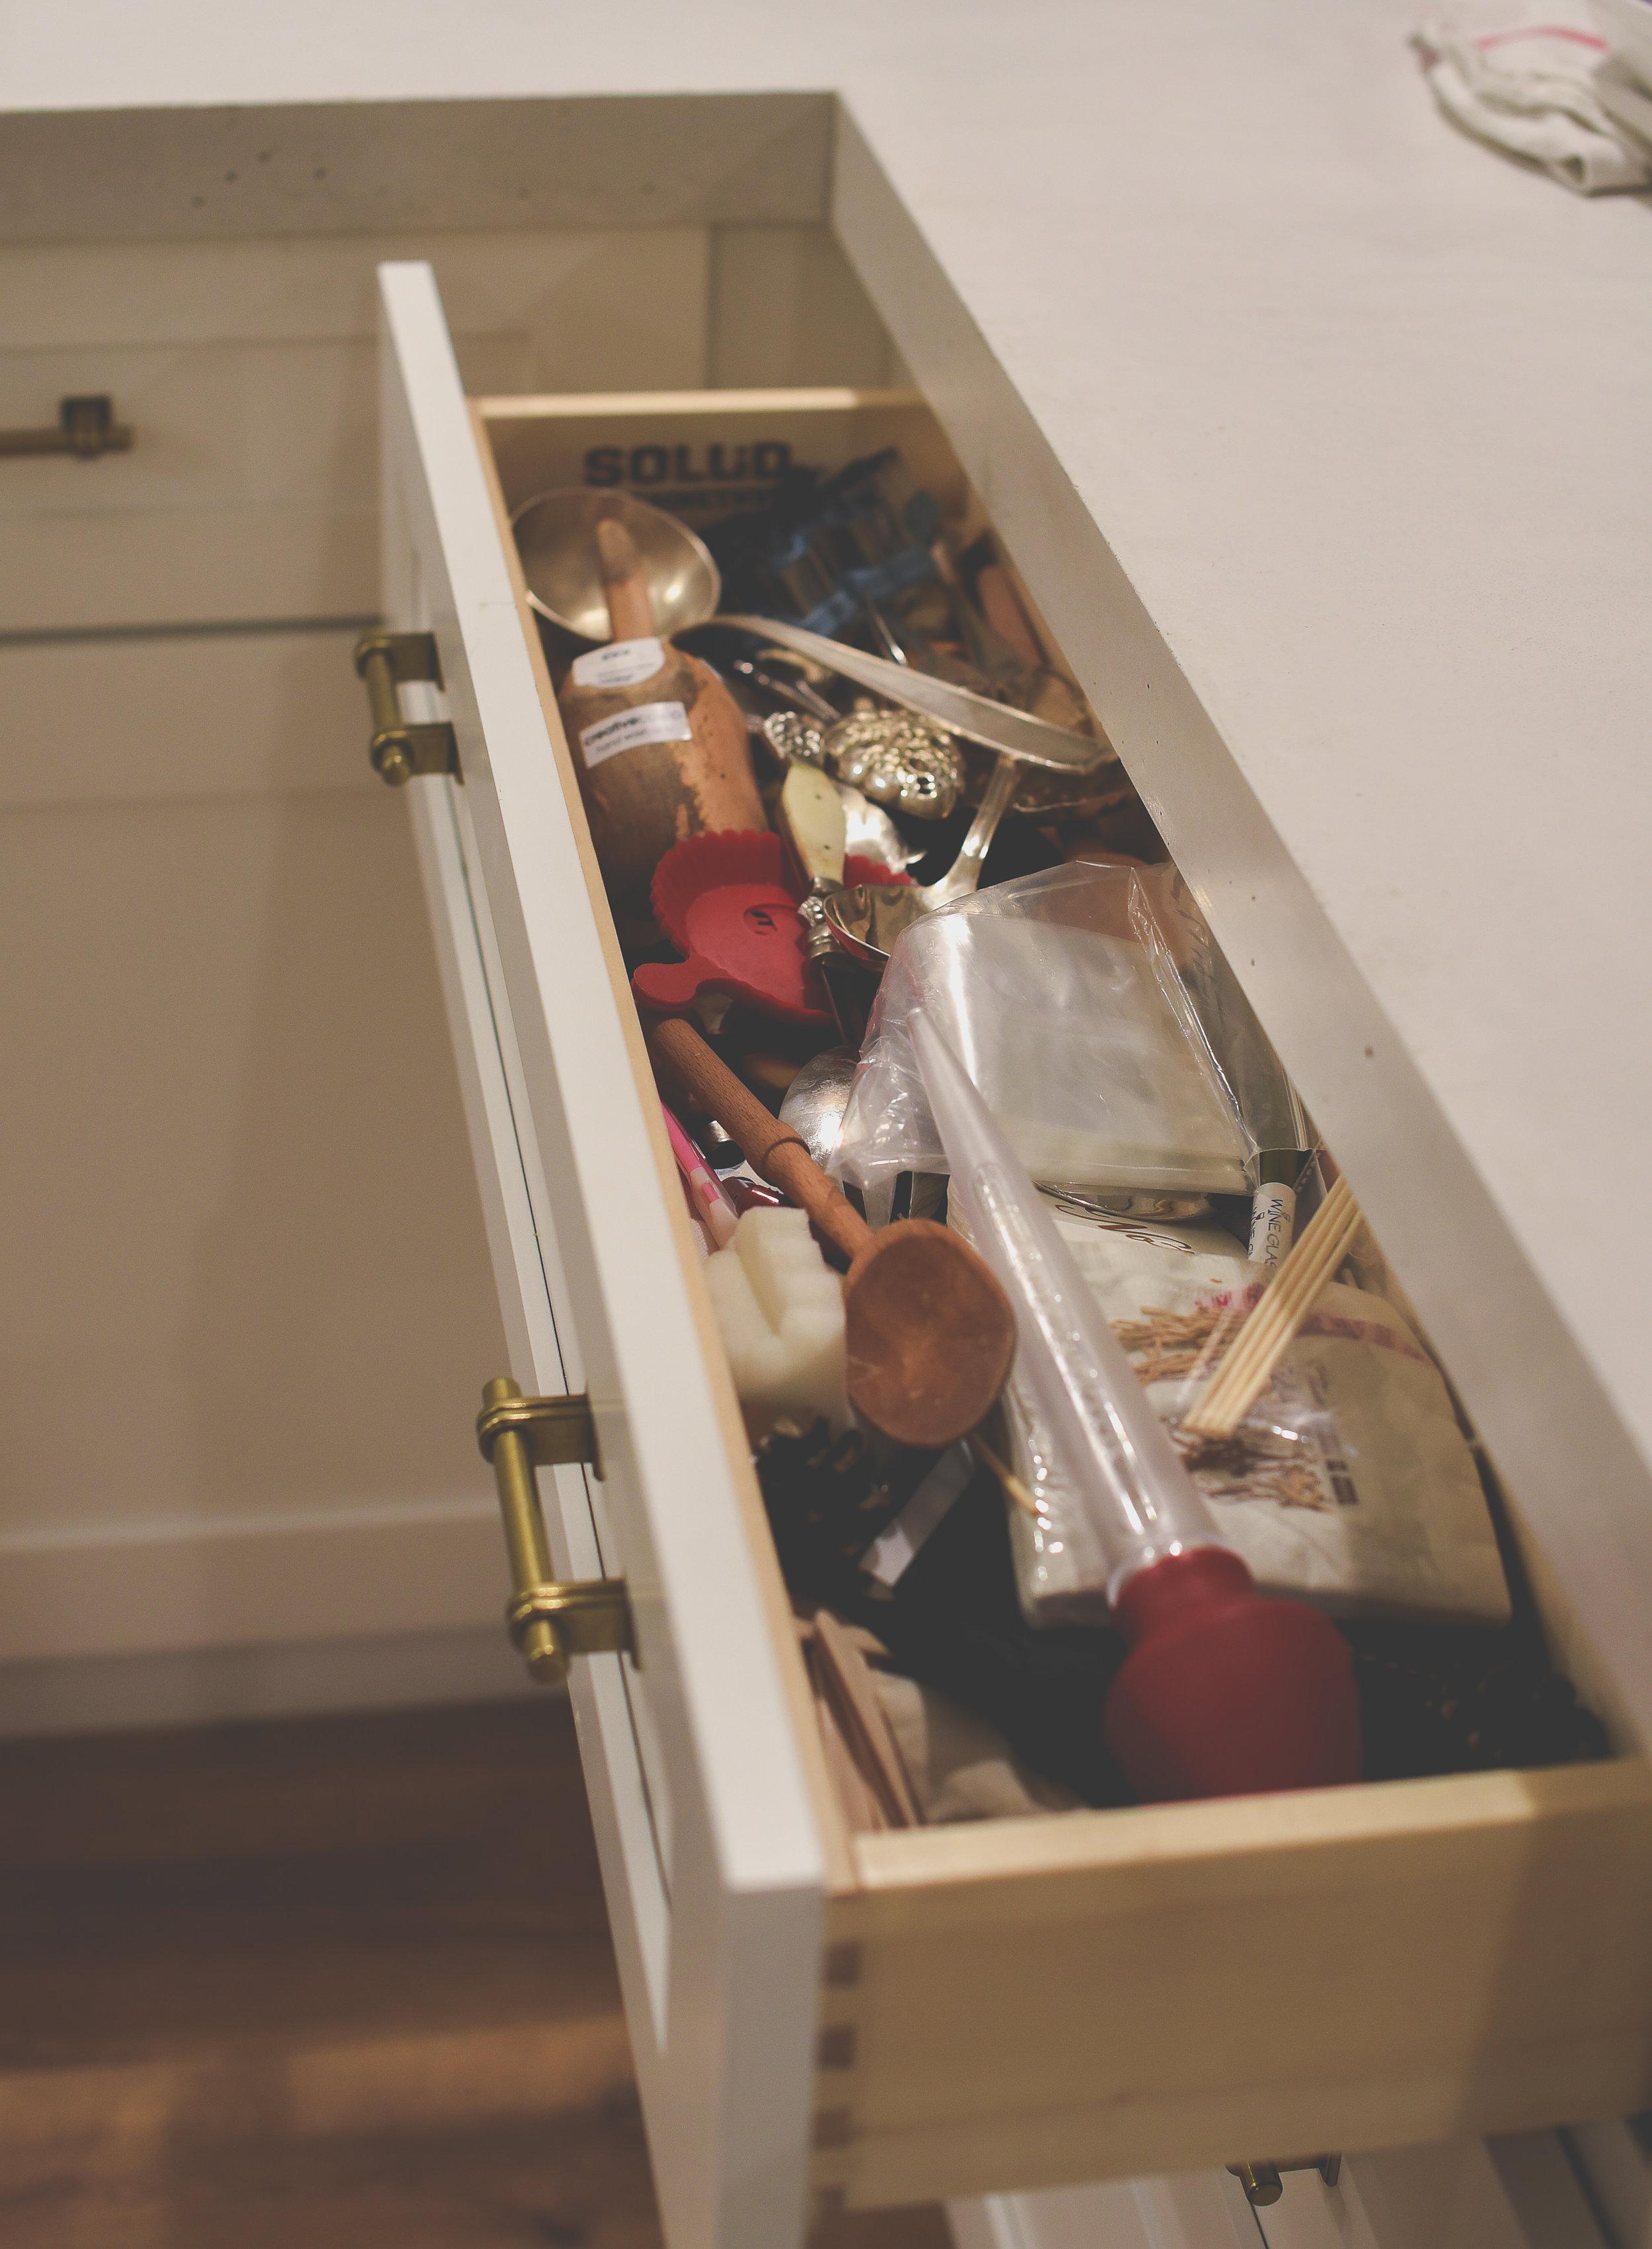 How to organize your kitchen cabinets - kitchen organization ideas | boxwoodavenue.com